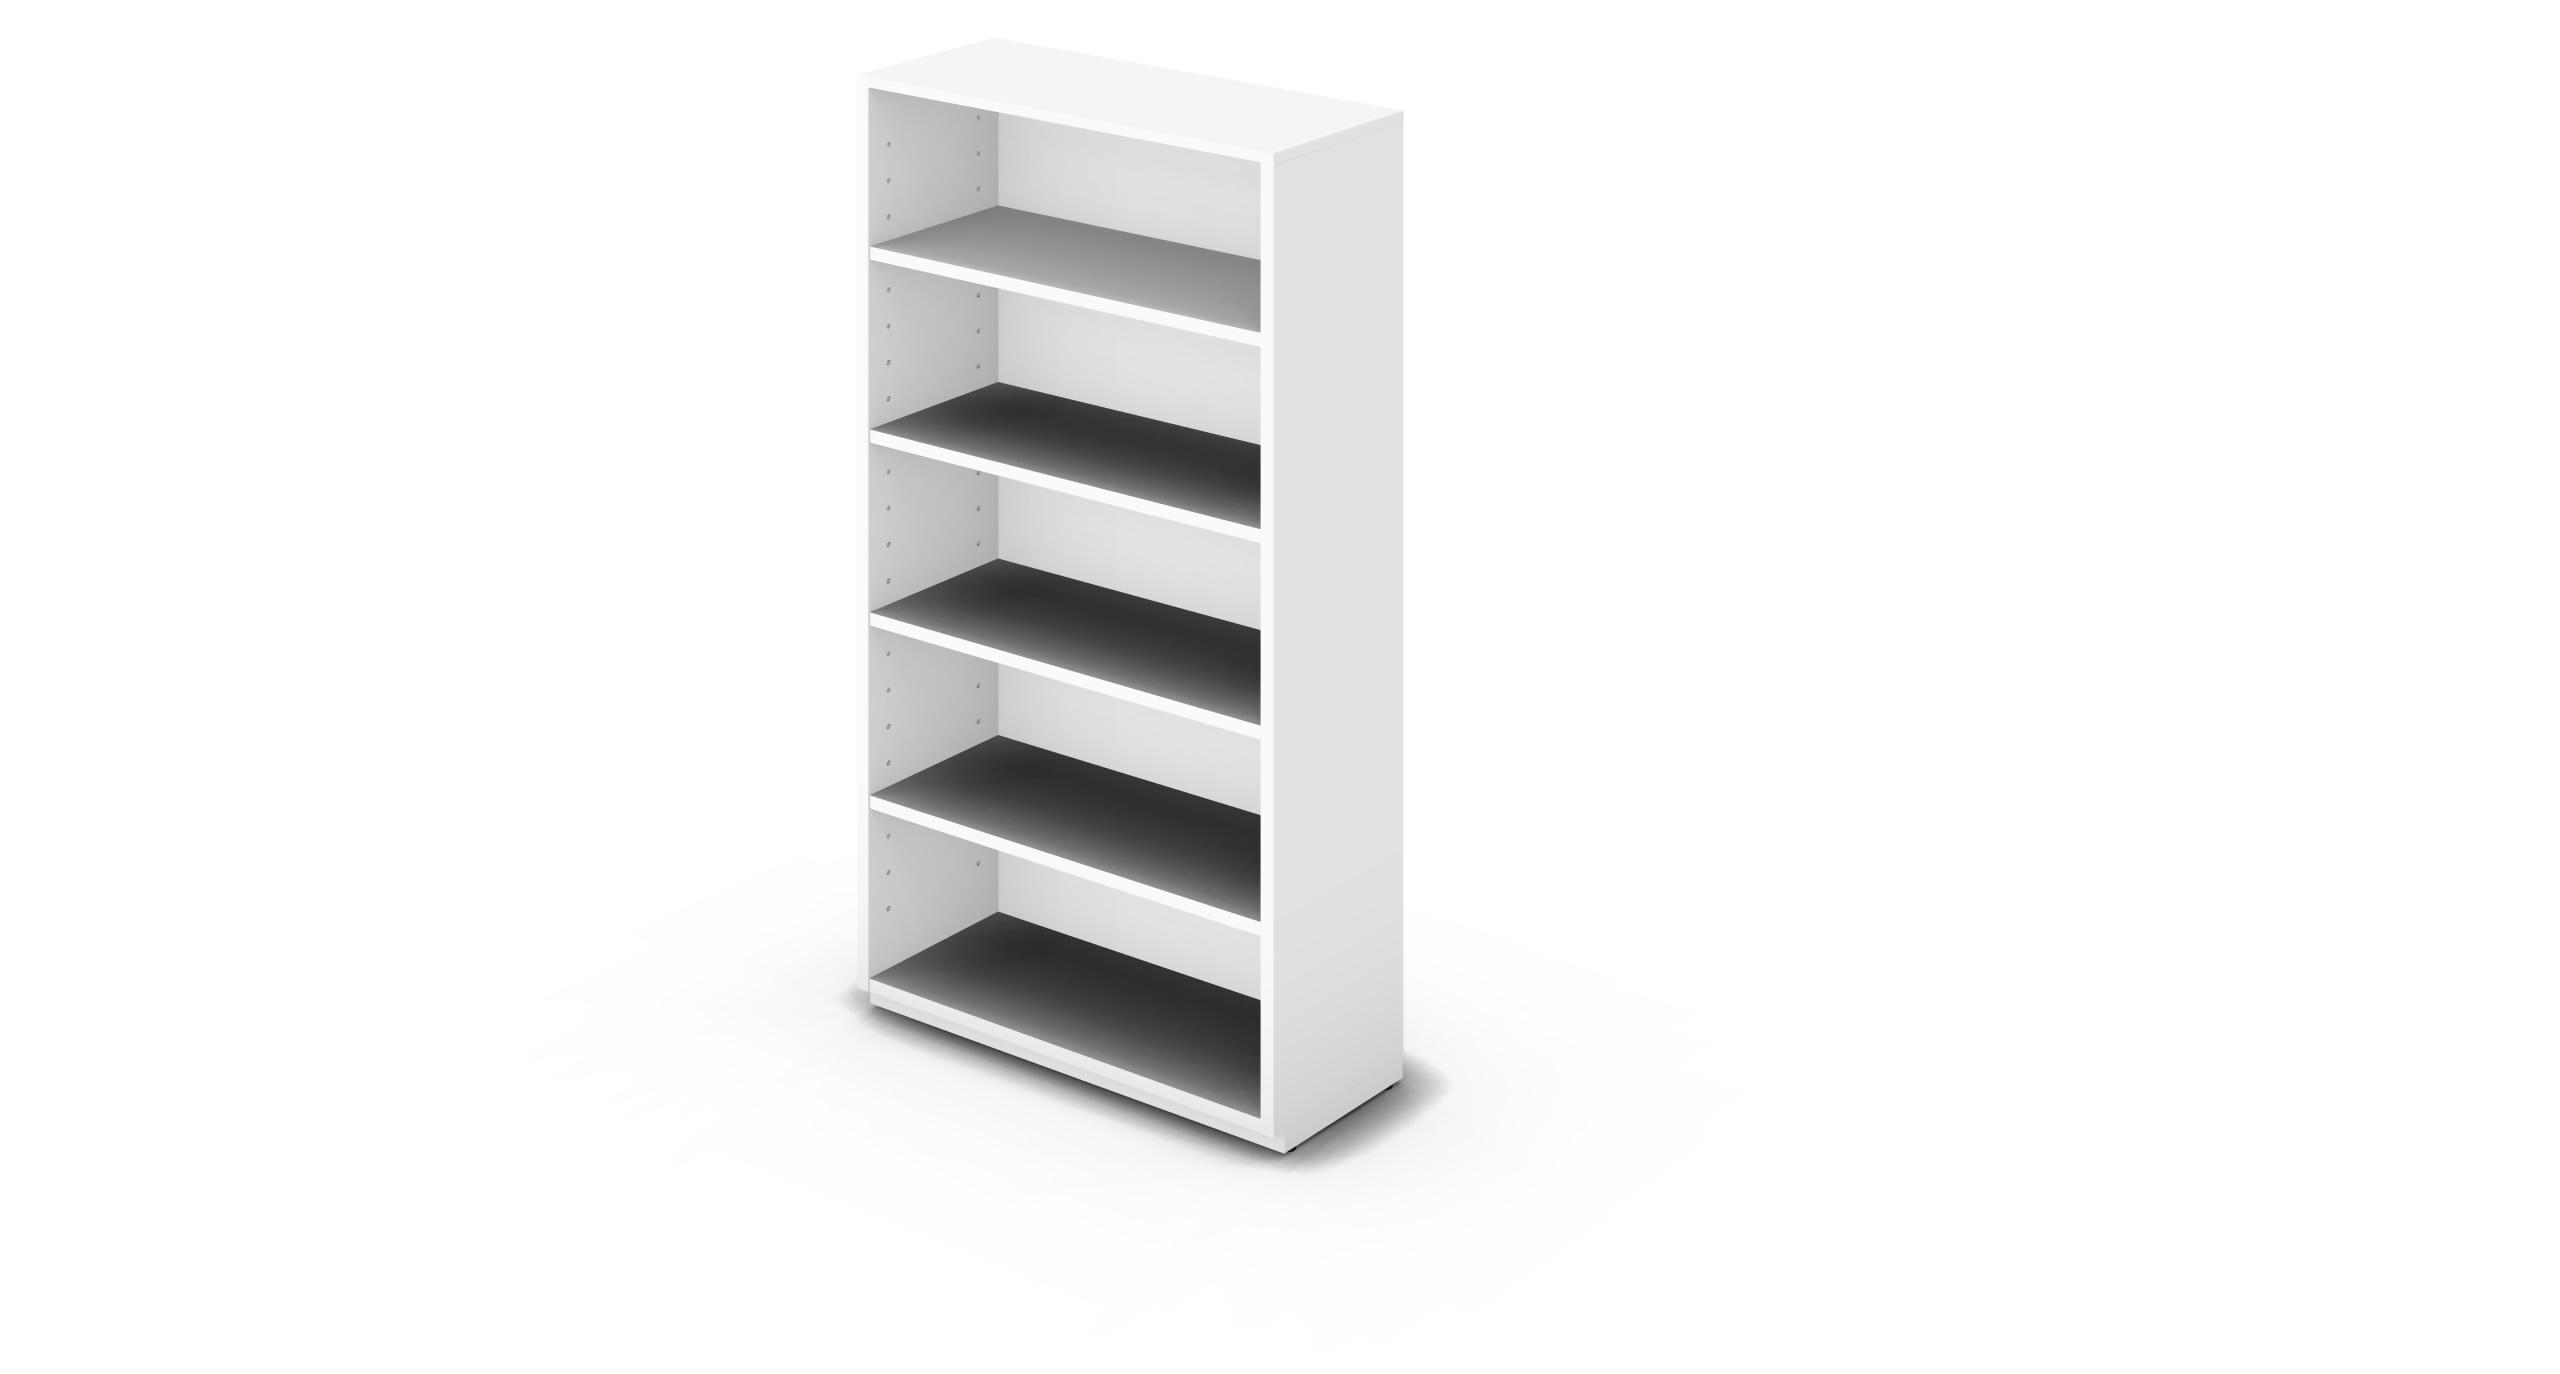 Shelf_900x350x1800_White